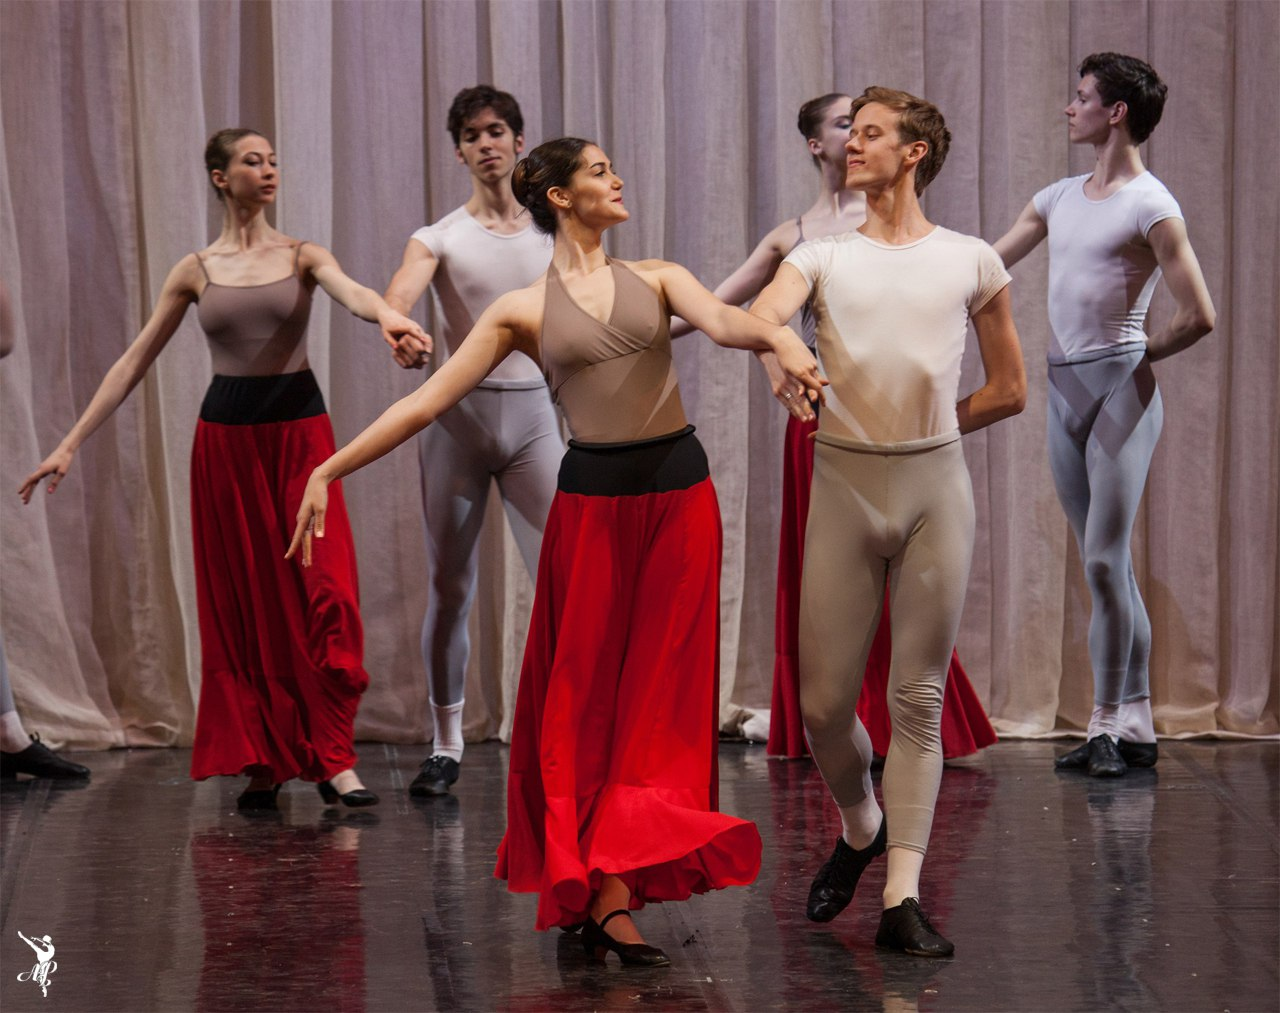 http://vaganovaacademy.ru/vaganova/news/photo/2017.05.11_Hermitage_theatre/Paquita-2.jpg